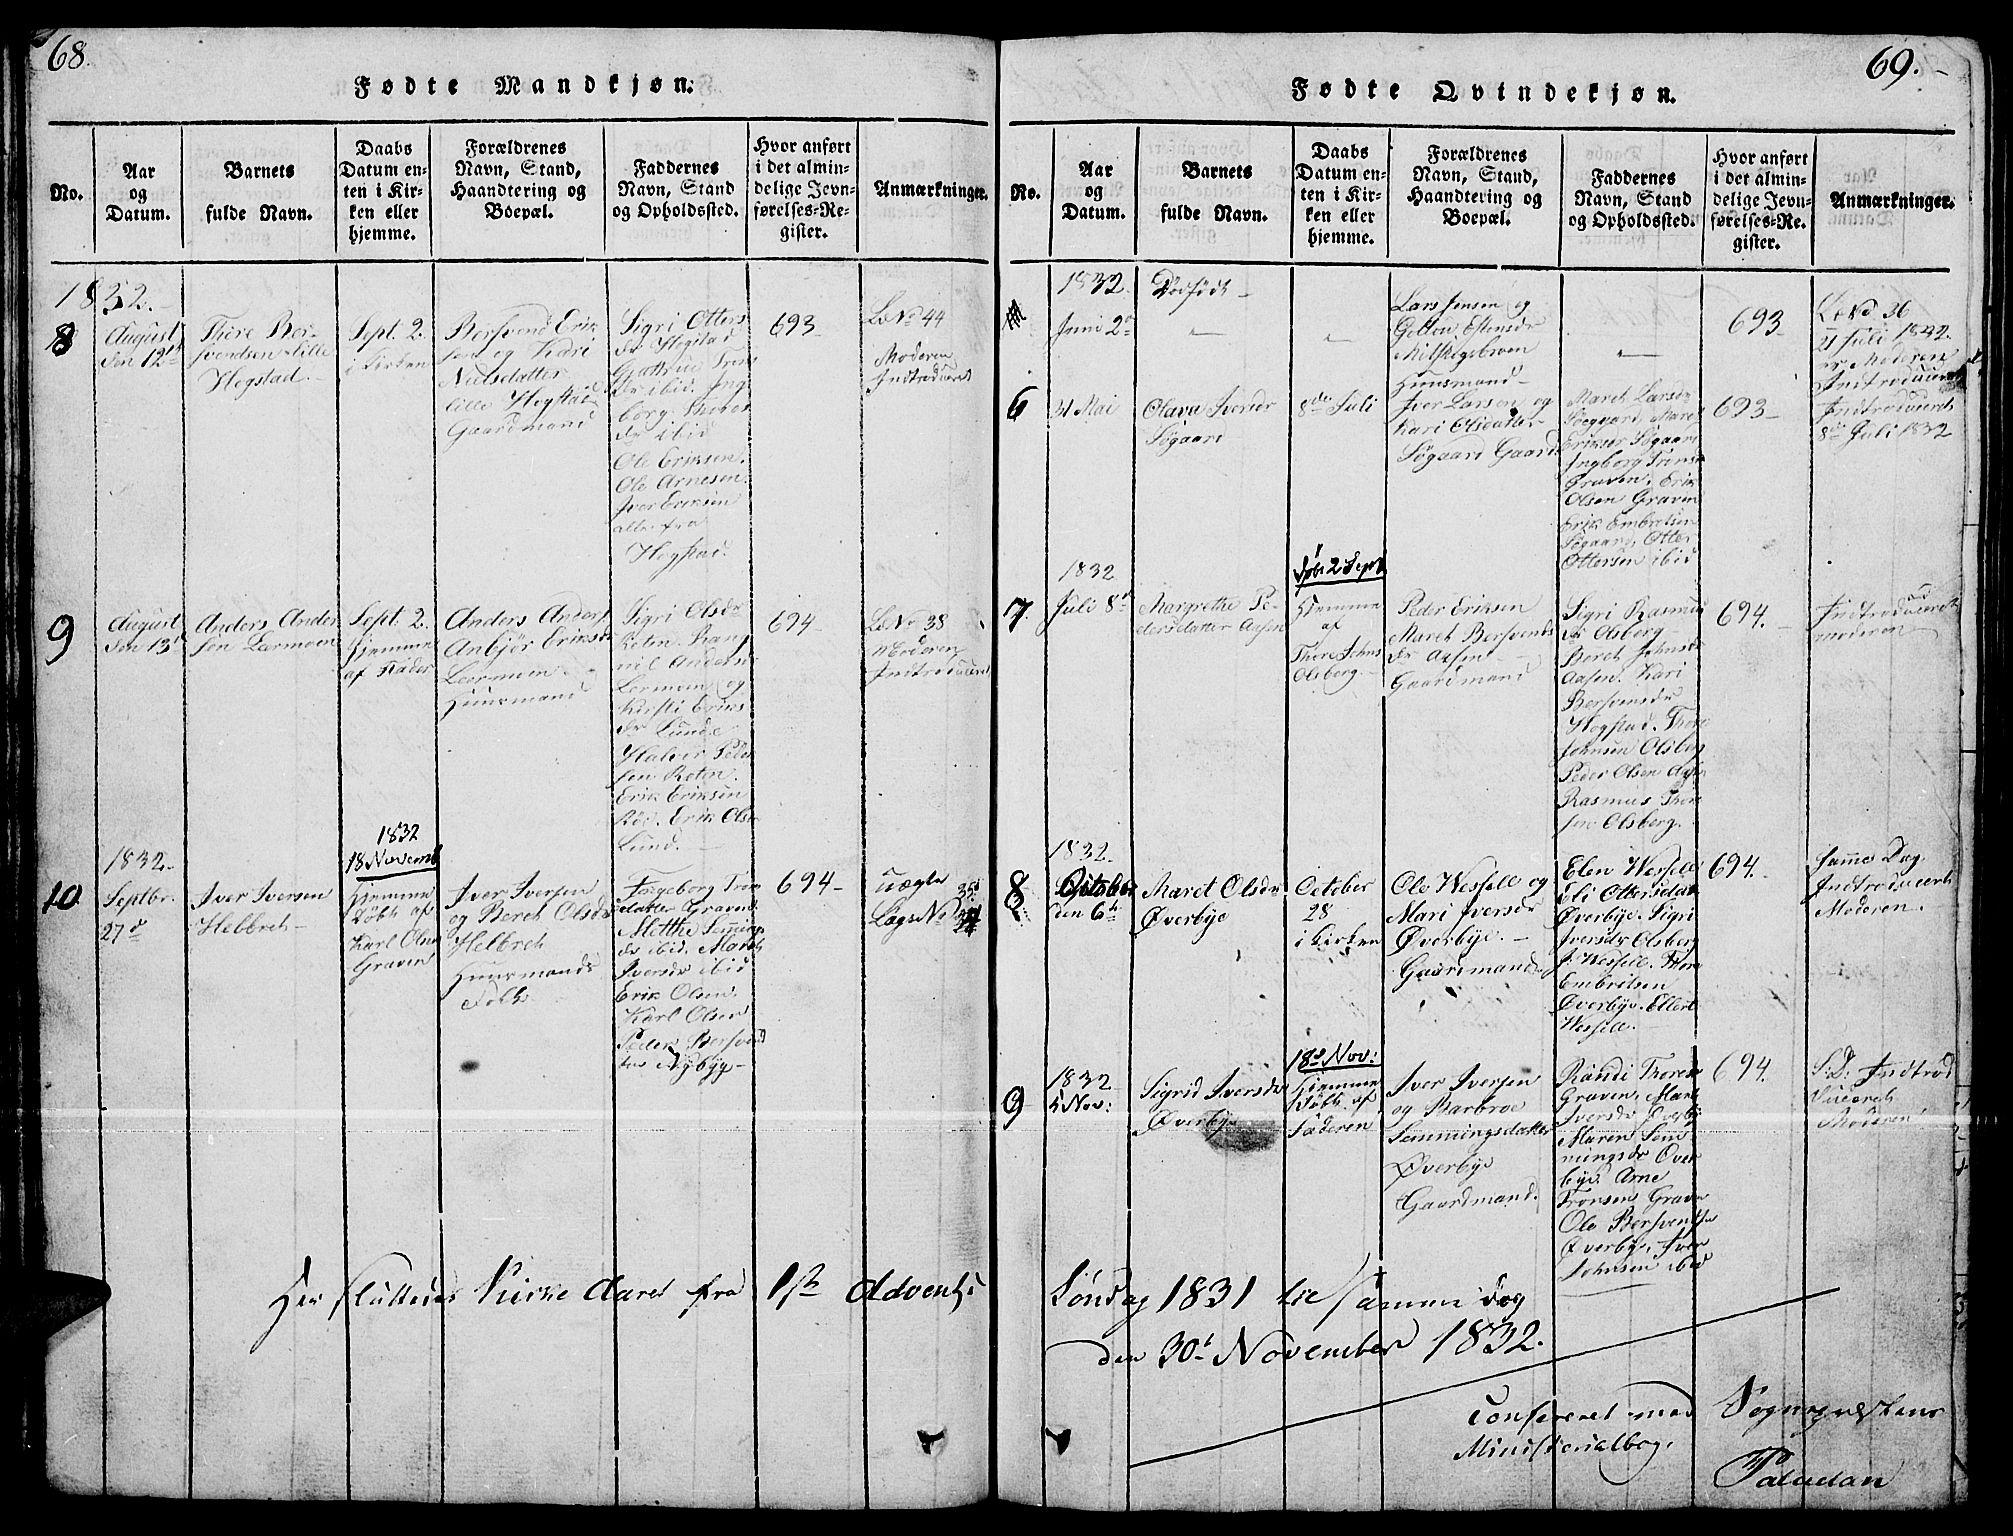 SAH, Tynset prestekontor, Klokkerbok nr. 4, 1814-1879, s. 68-69